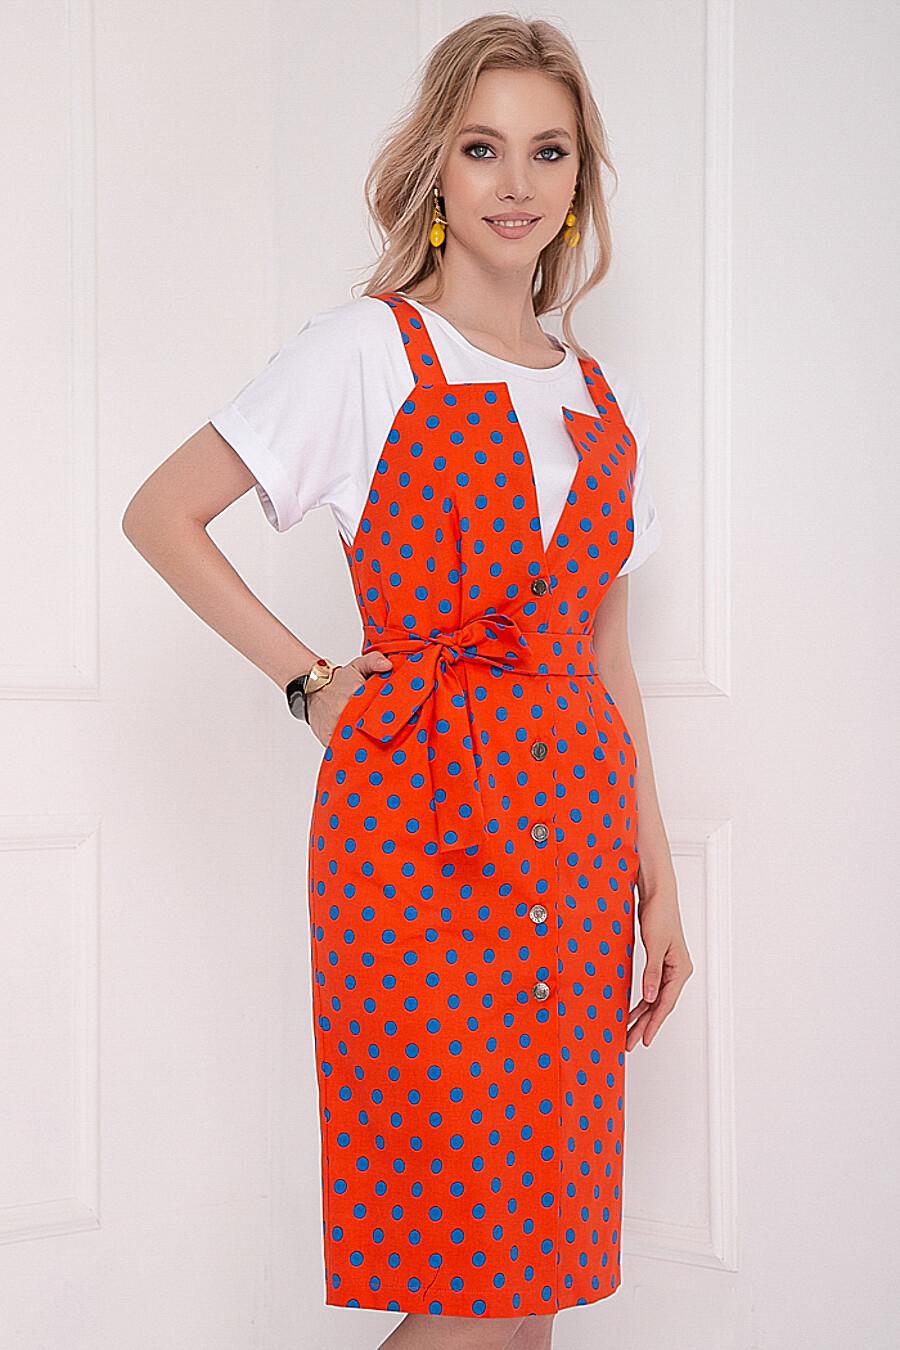 Сарафан BELLOVERA (666299), купить в Moyo.moda